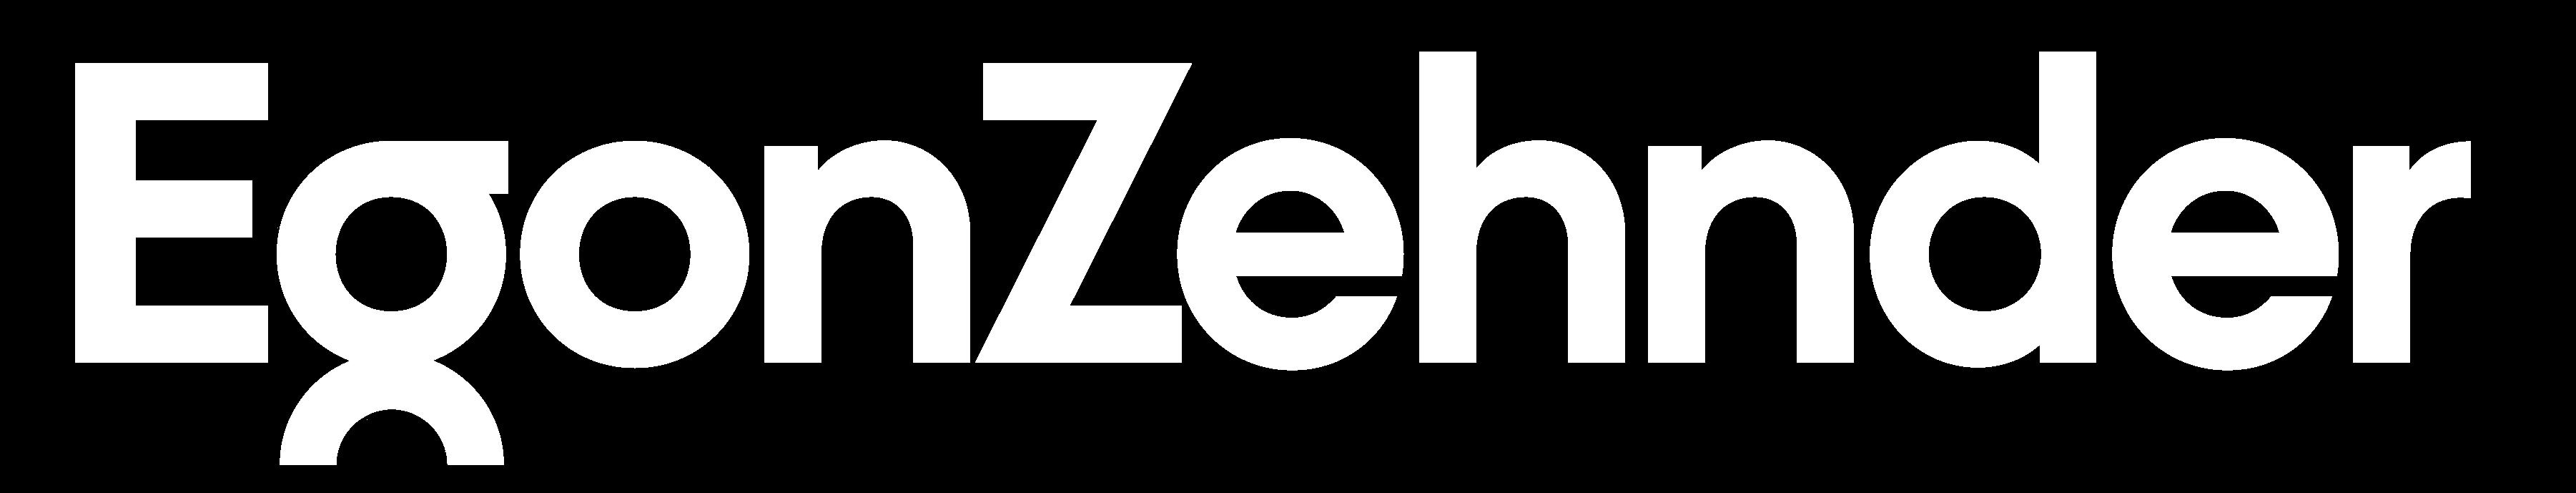 Egon Zehnder Alumni Logo